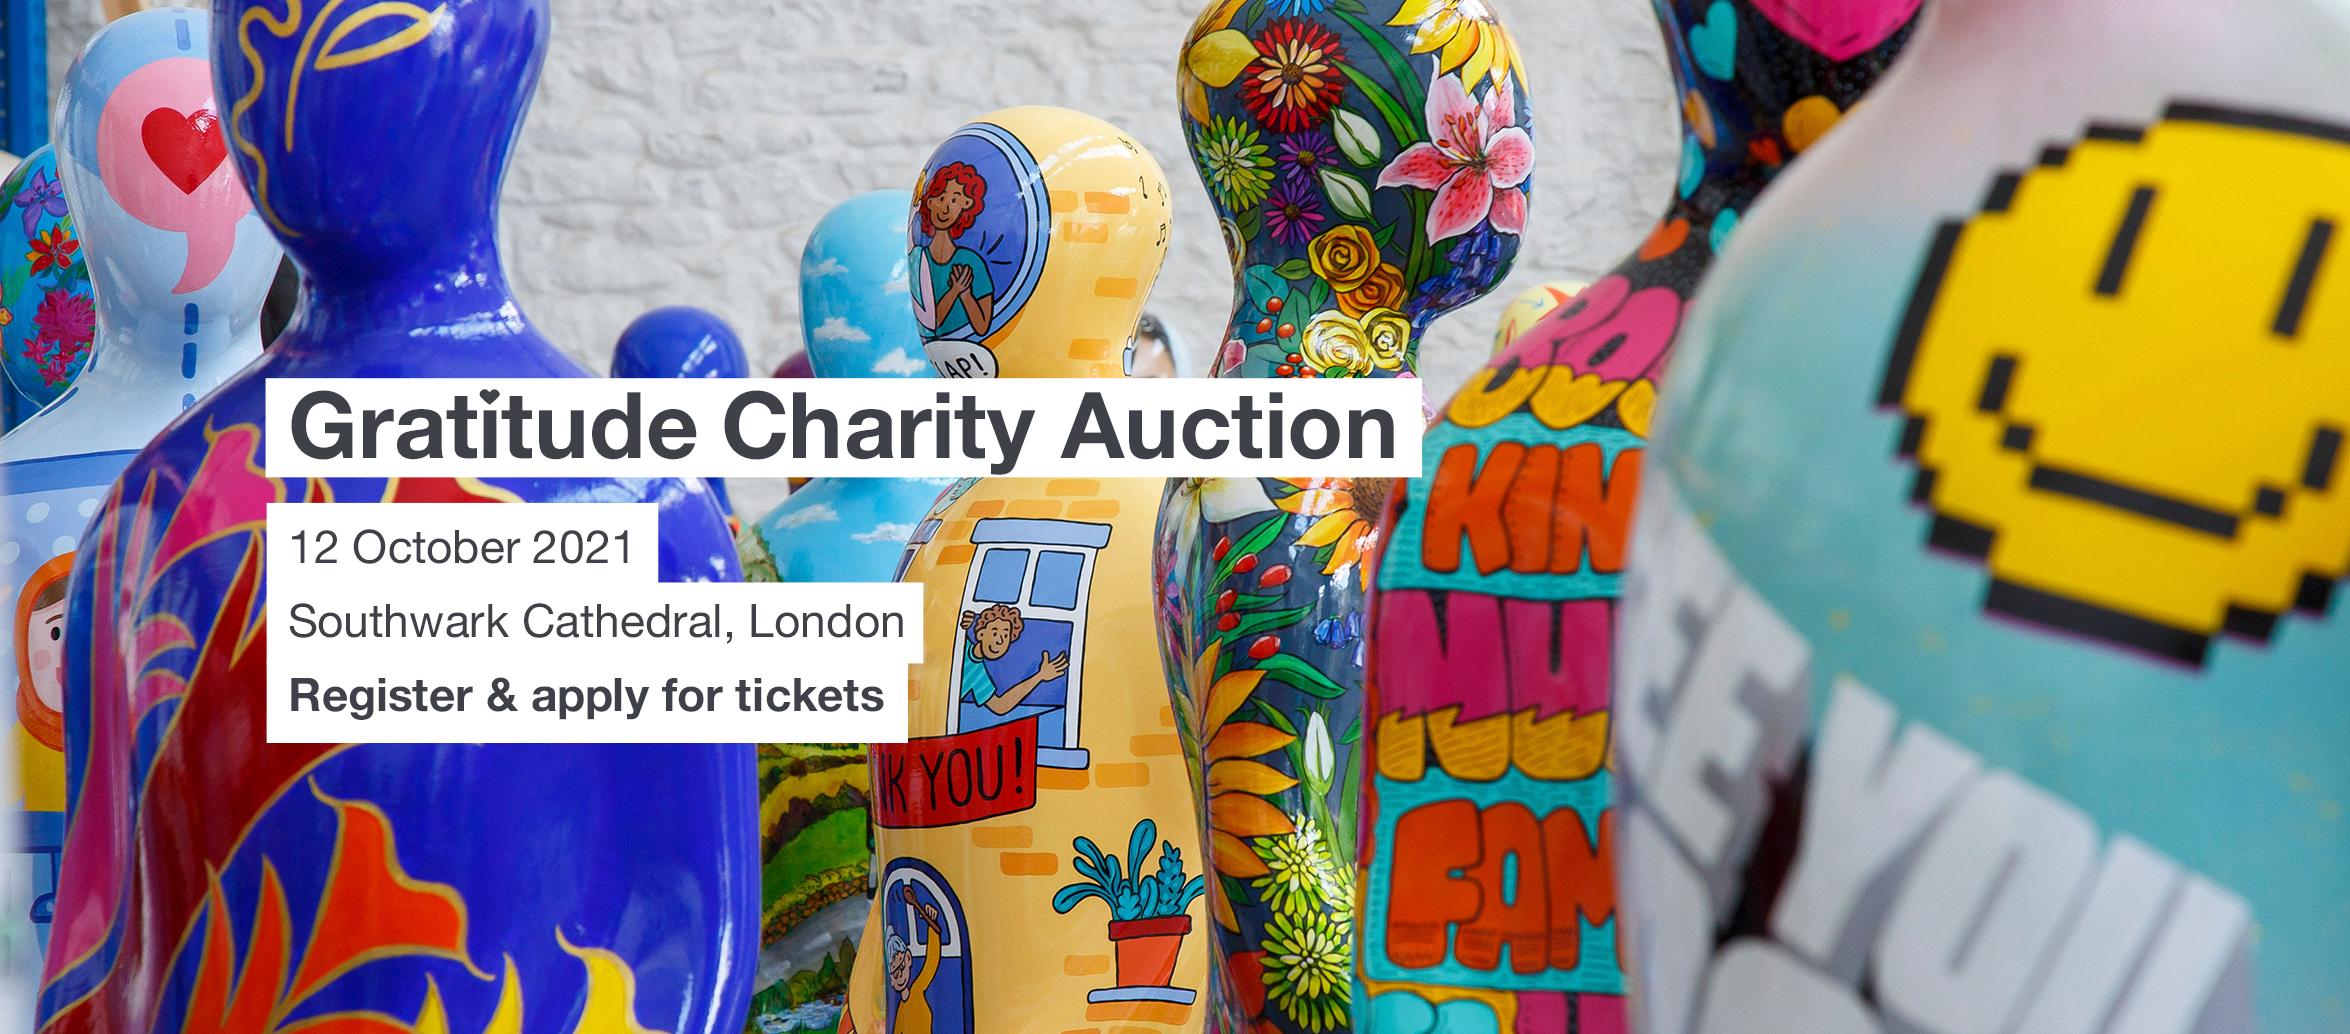 Gratitude Charity Auction